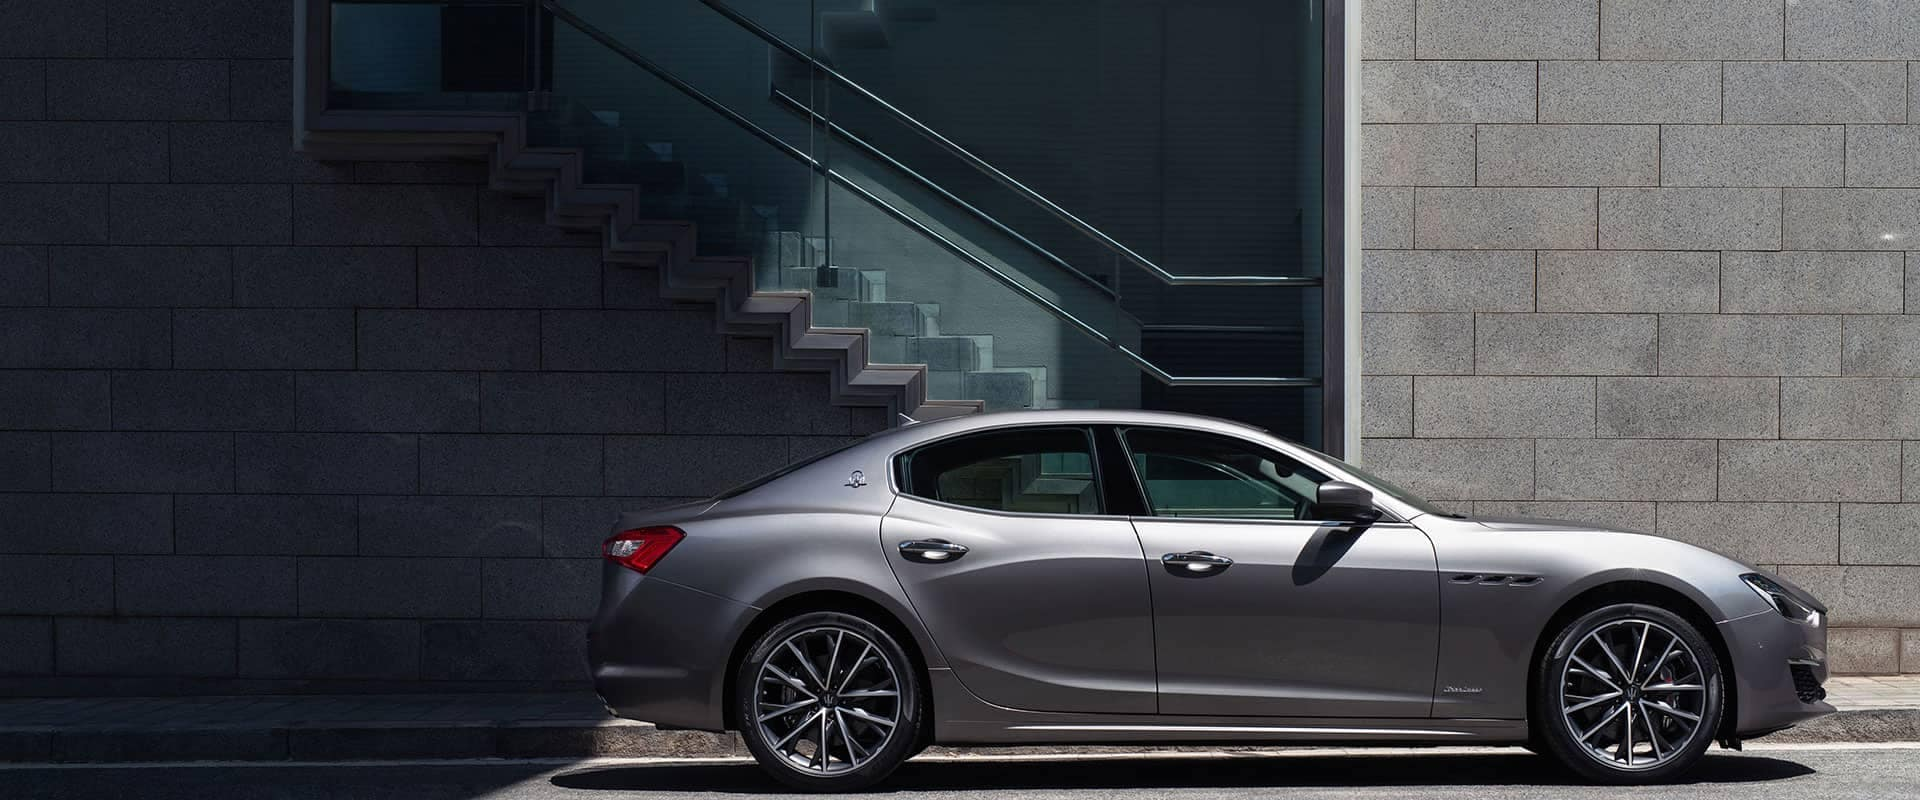 Silver 2019 Maserati Ghibli Sideview